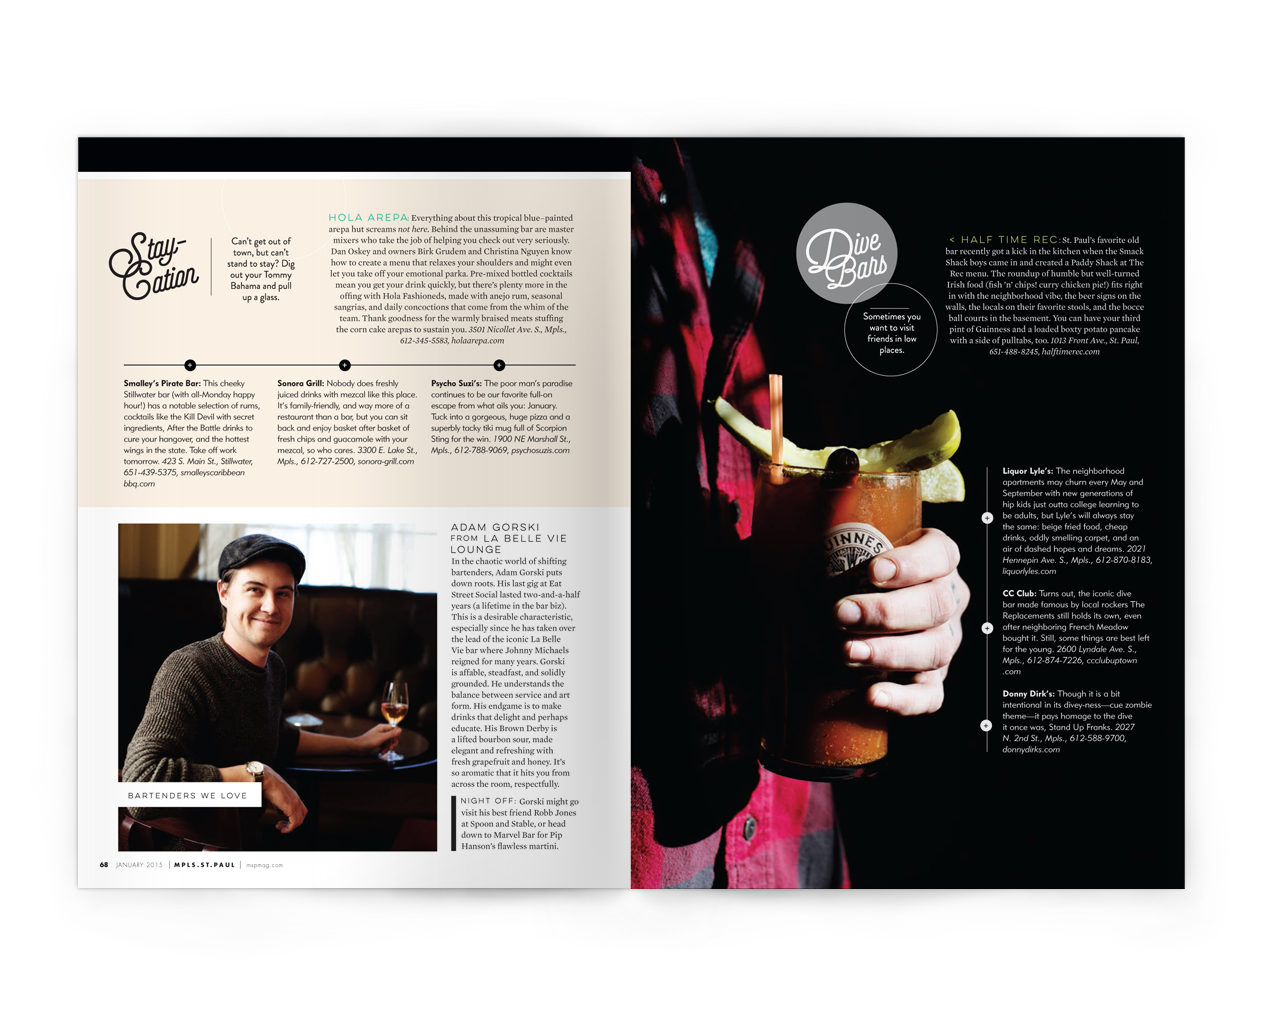 Creative Direction + Design: Liz Gardner for Mpls. St.Paul magazine Editor: Stephanie March Photos: Eliesa Johnson